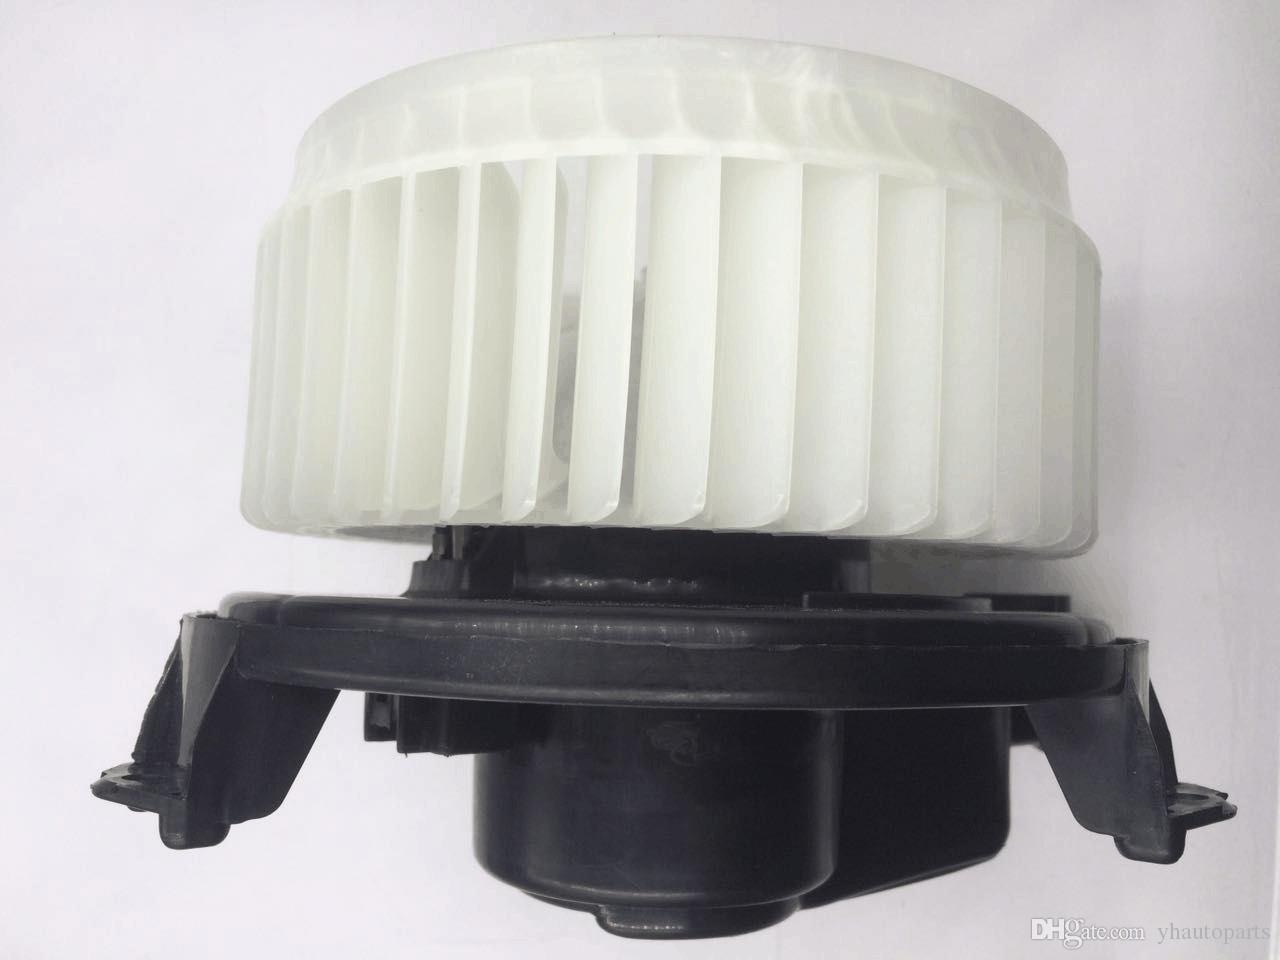 AC Blower Motor hiace / Fan Assembléia Blower para TOYOTA COROLLA 2008 2010 87103-4209 272700-5151